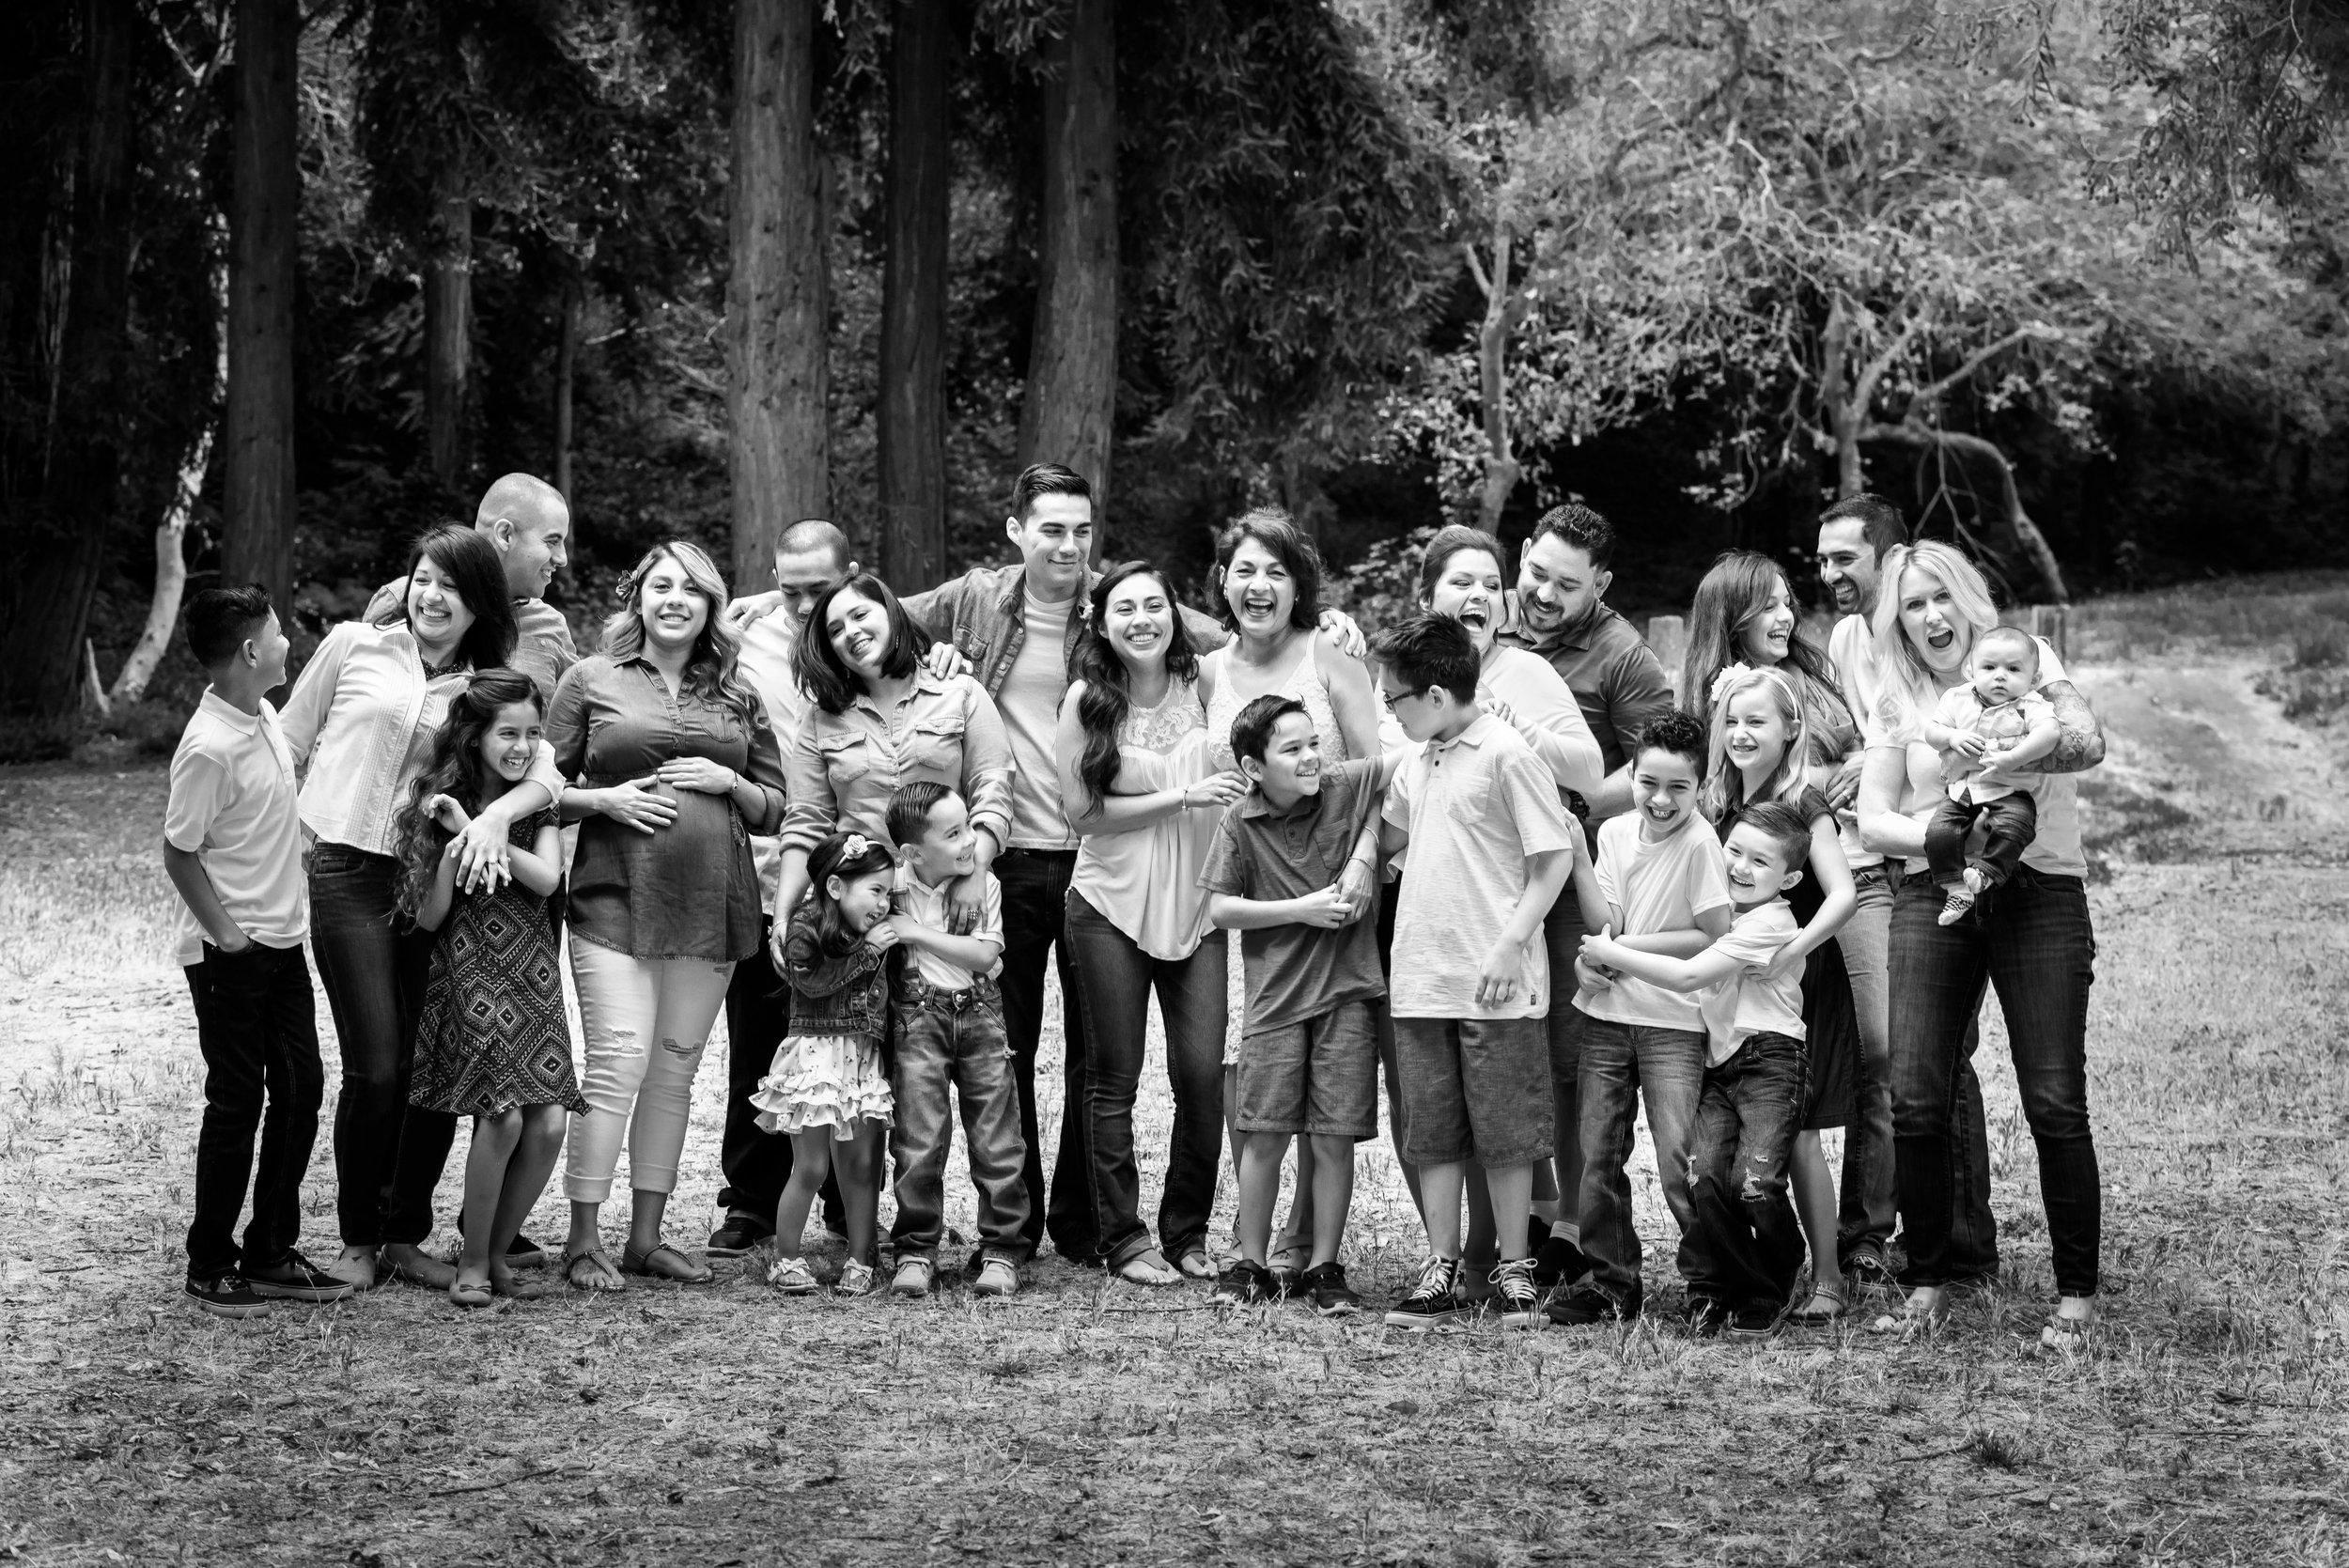 1649_Linda_M_Harvey_West_Park_Santa_Cruz_Reunion_Multi-Generation_Family_Photography.jpg